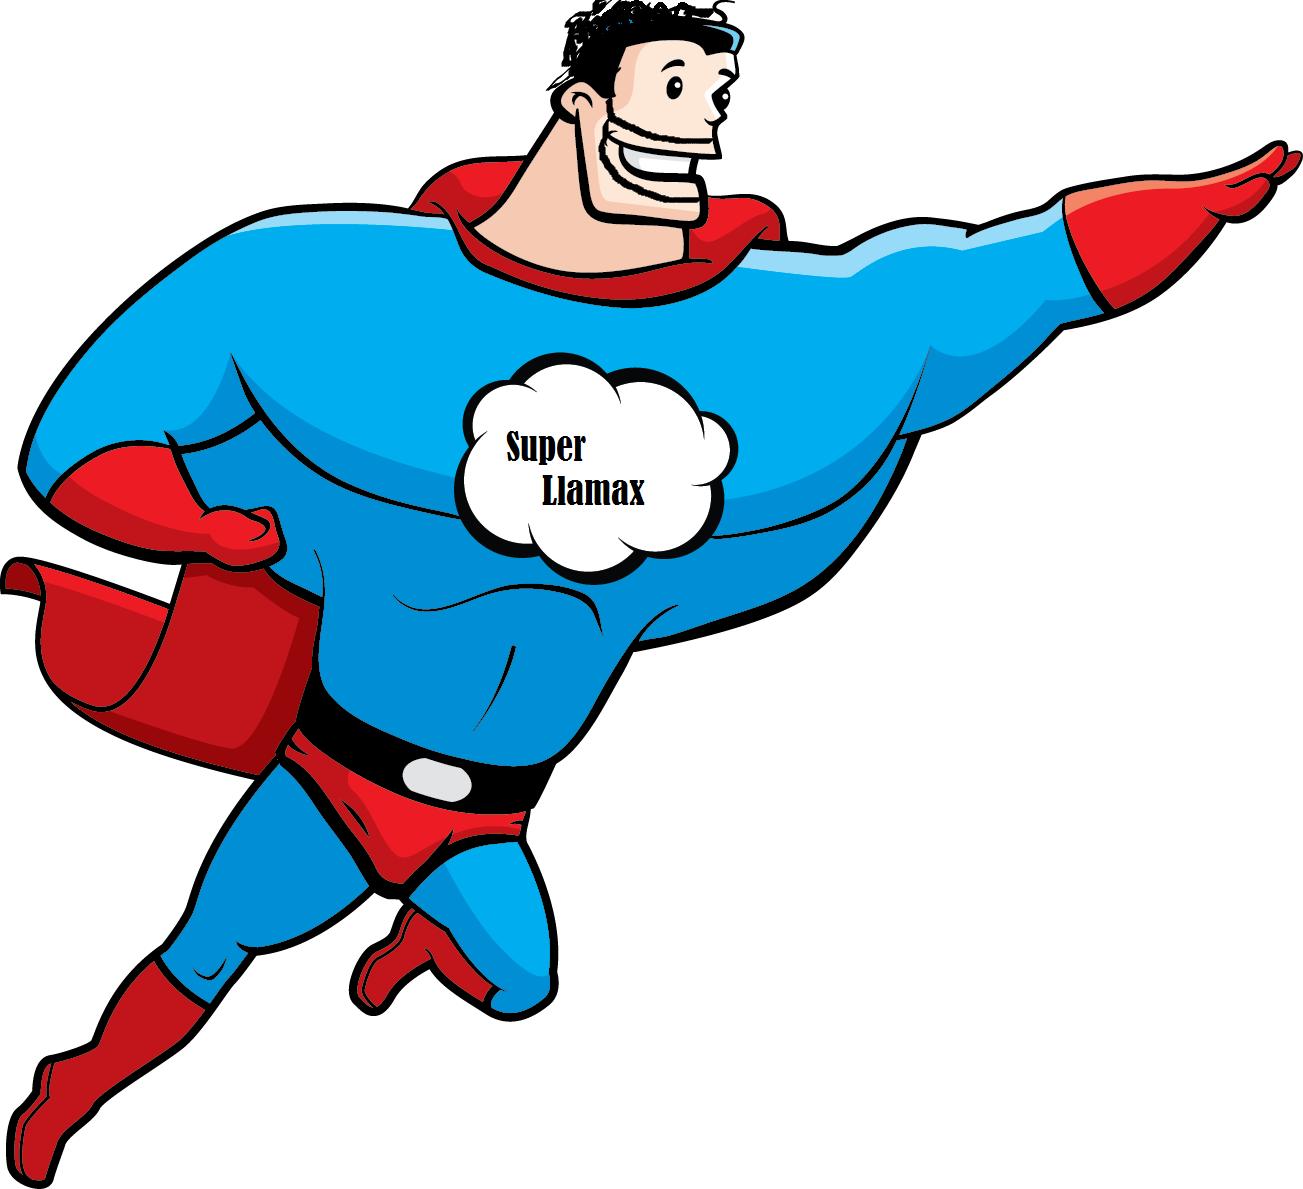 Superman hero essay